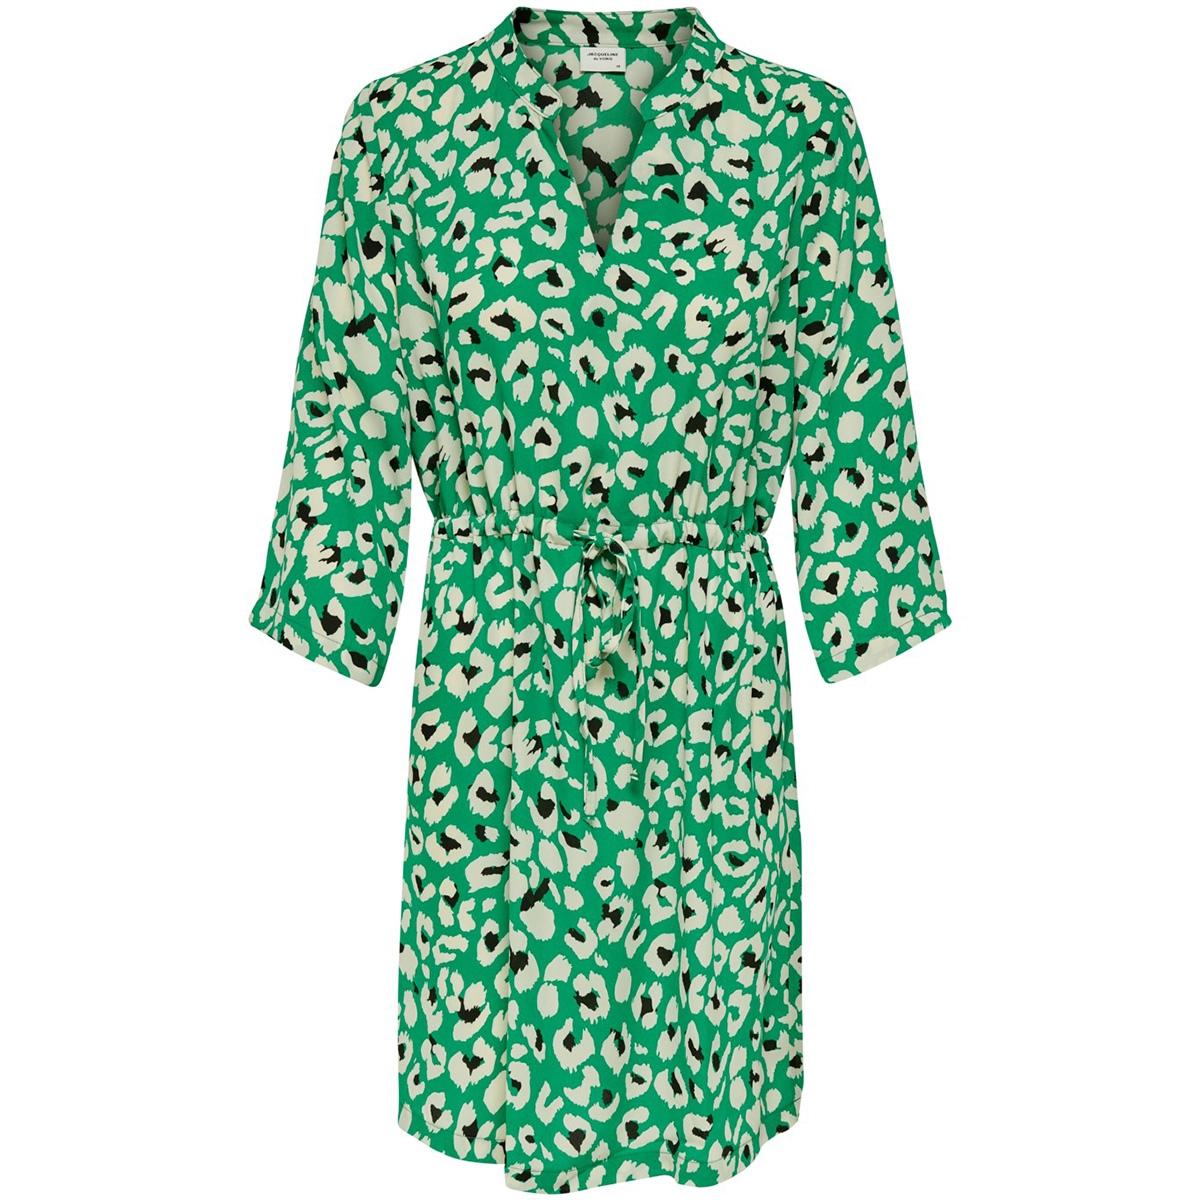 jdywin treats 3/4 dress wvn 15176867 jacqueline de yong jurk greenlake/white